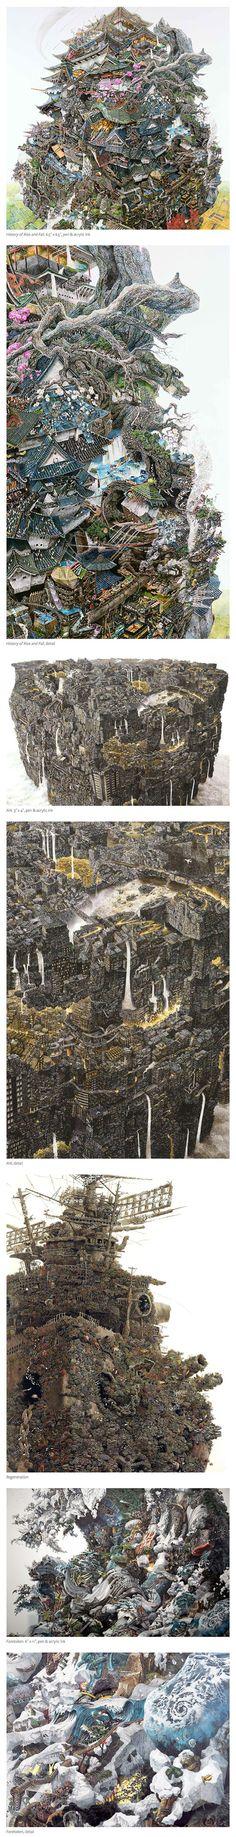 The monumental drawings of Ikeda Manabu :: http://mizuma-art.co.jp/artist/0030/index_e.php